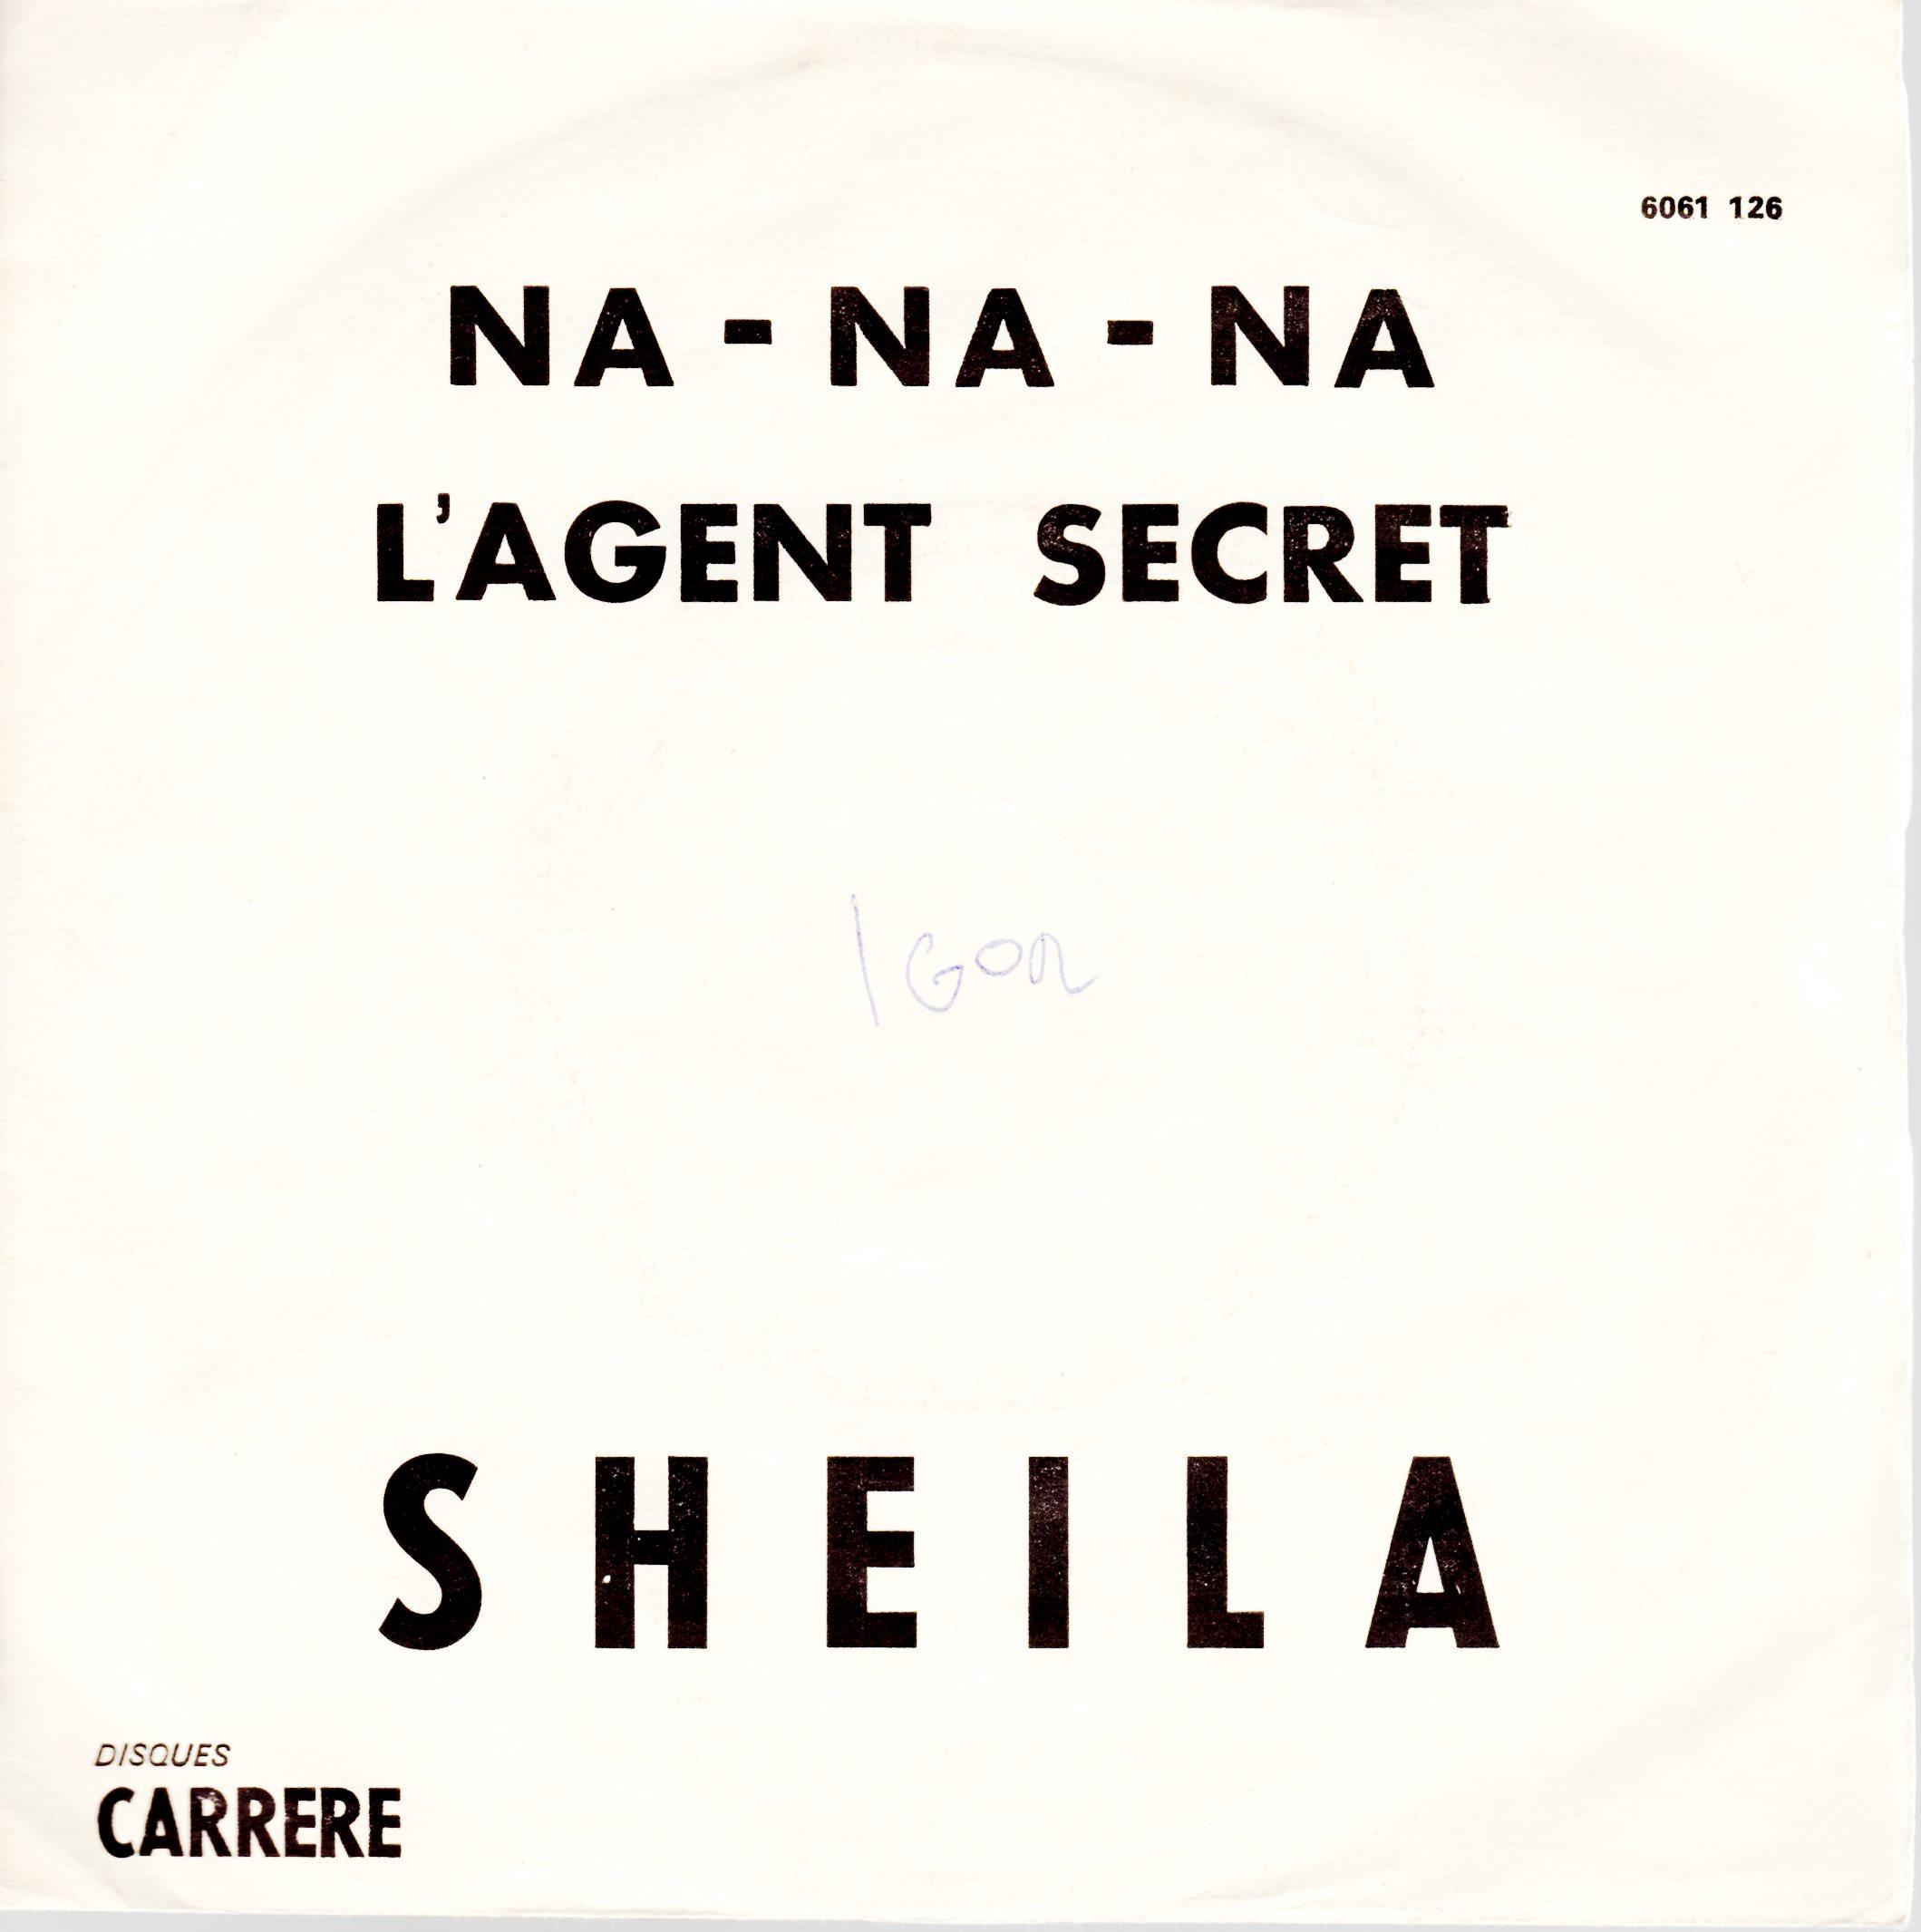 00 1970 12